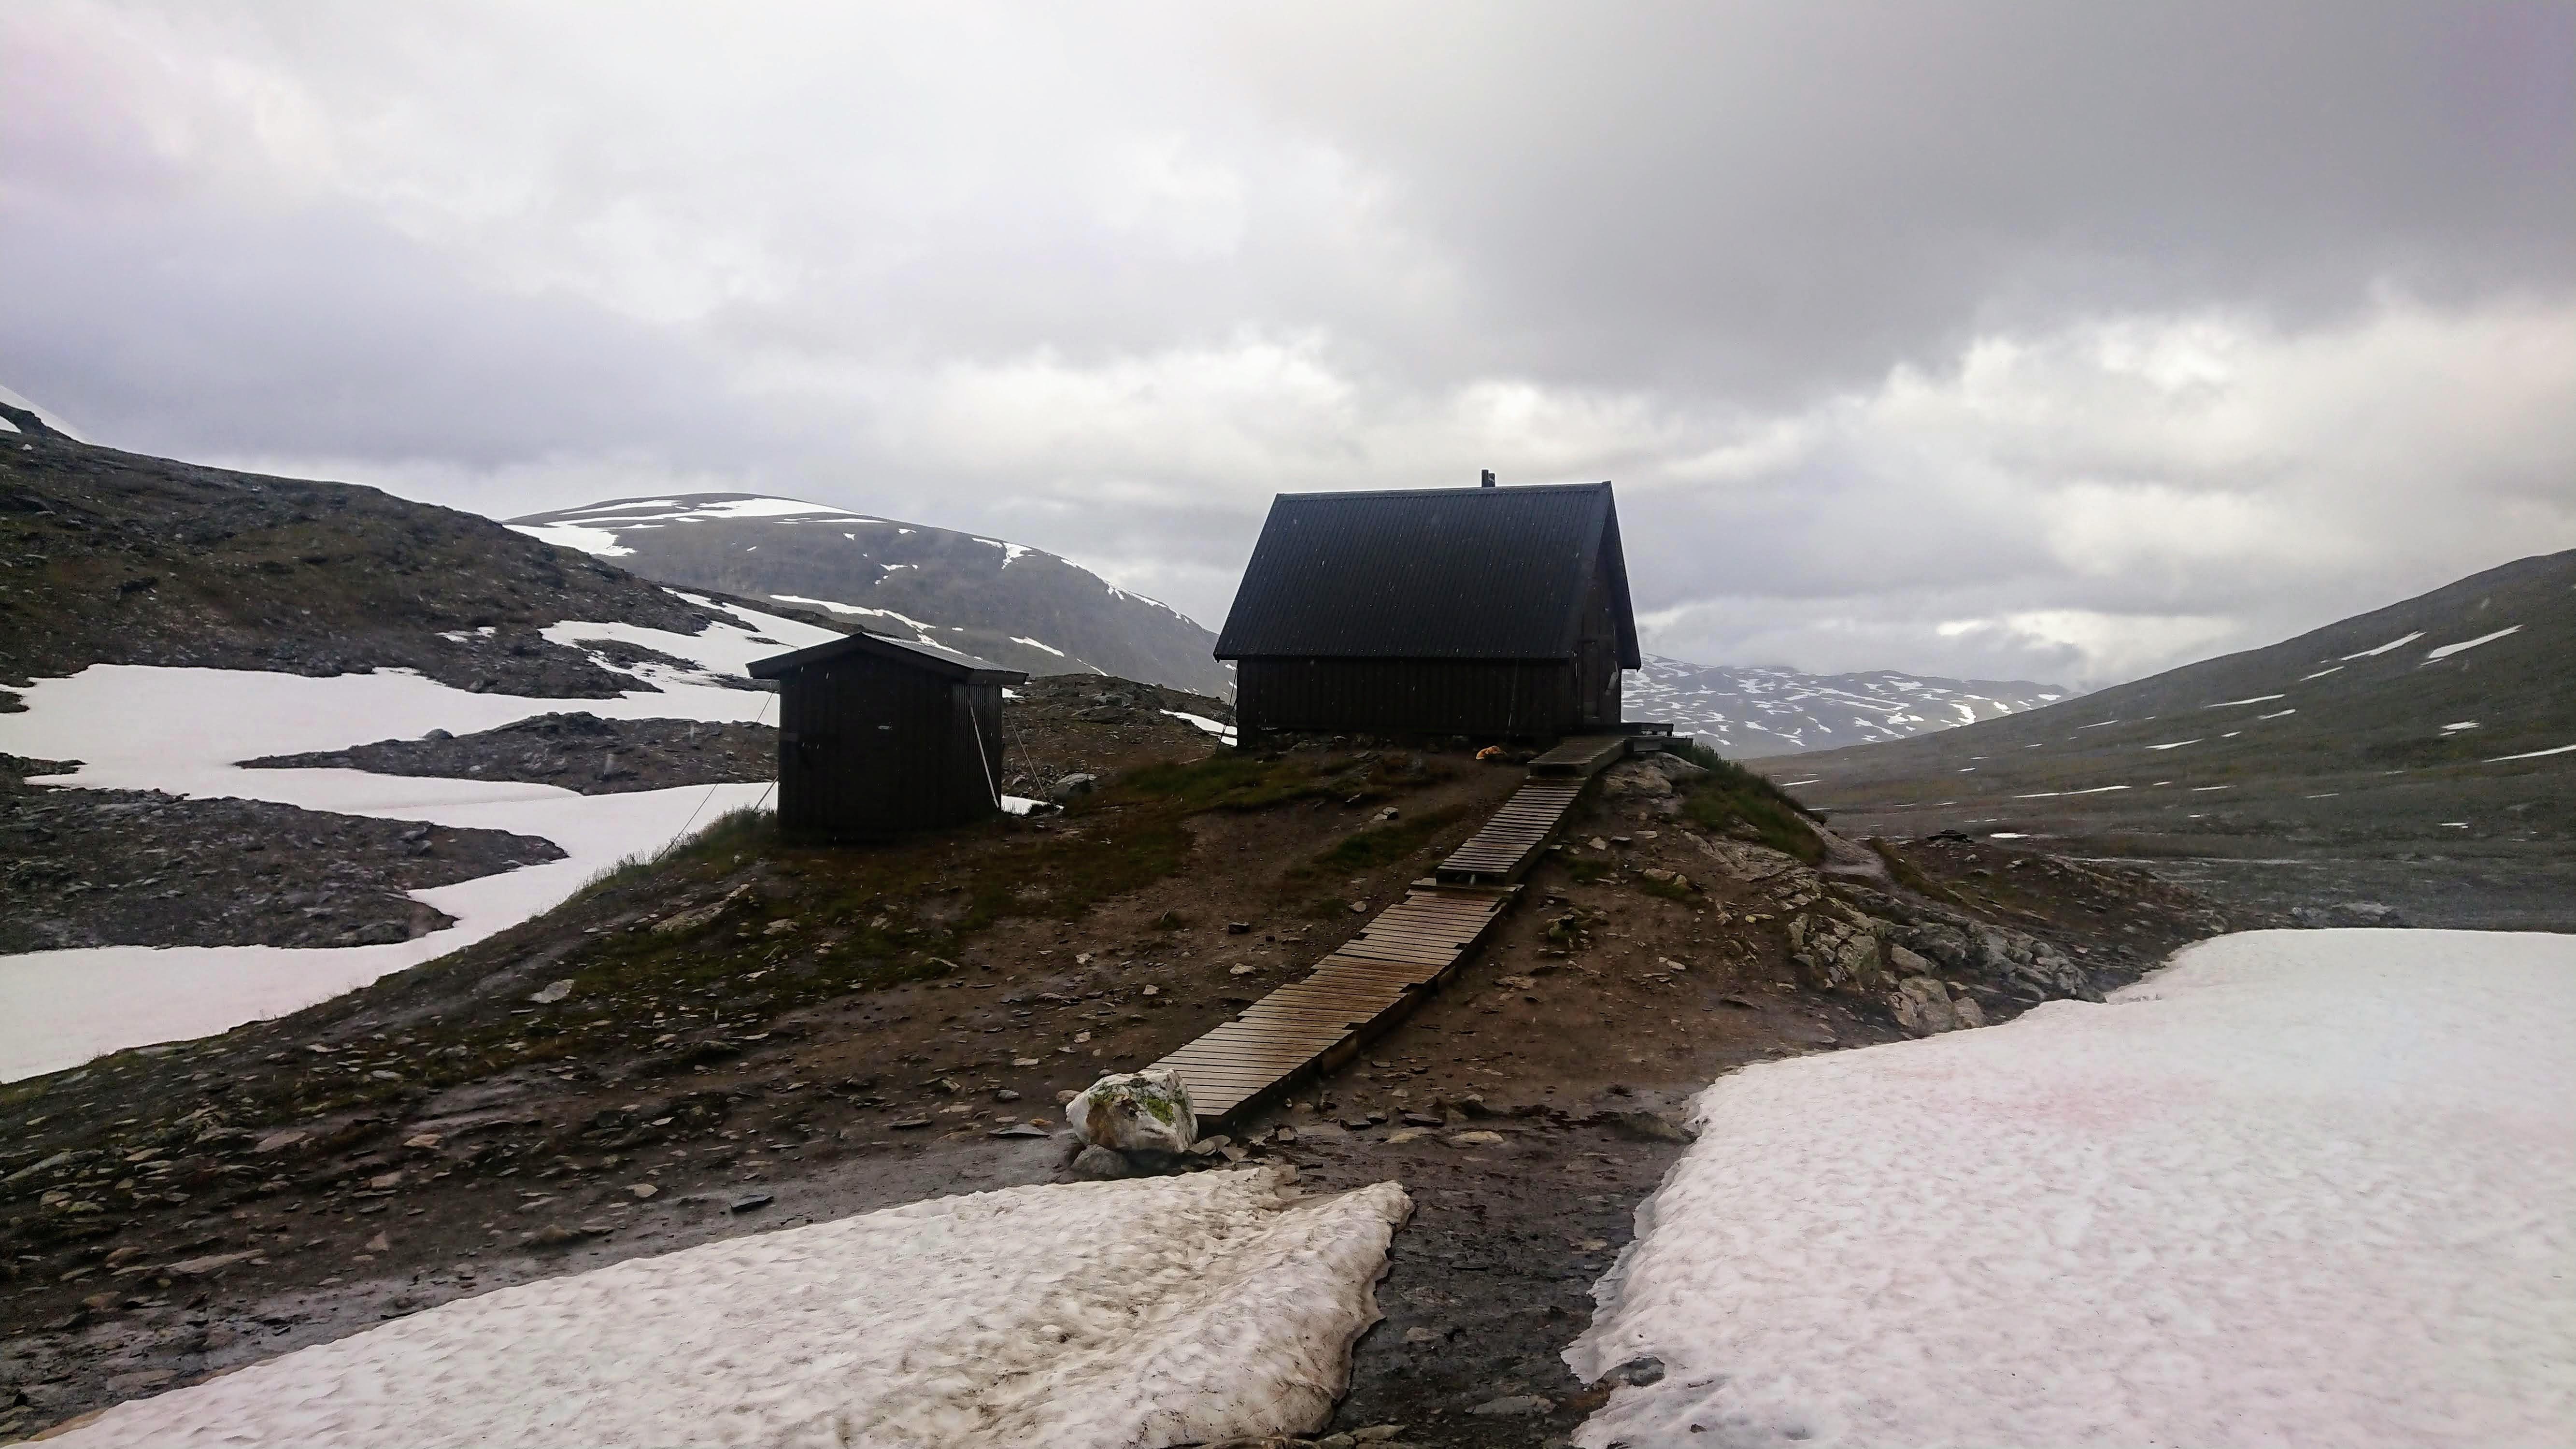 High point - Tjäktja pass 1150m